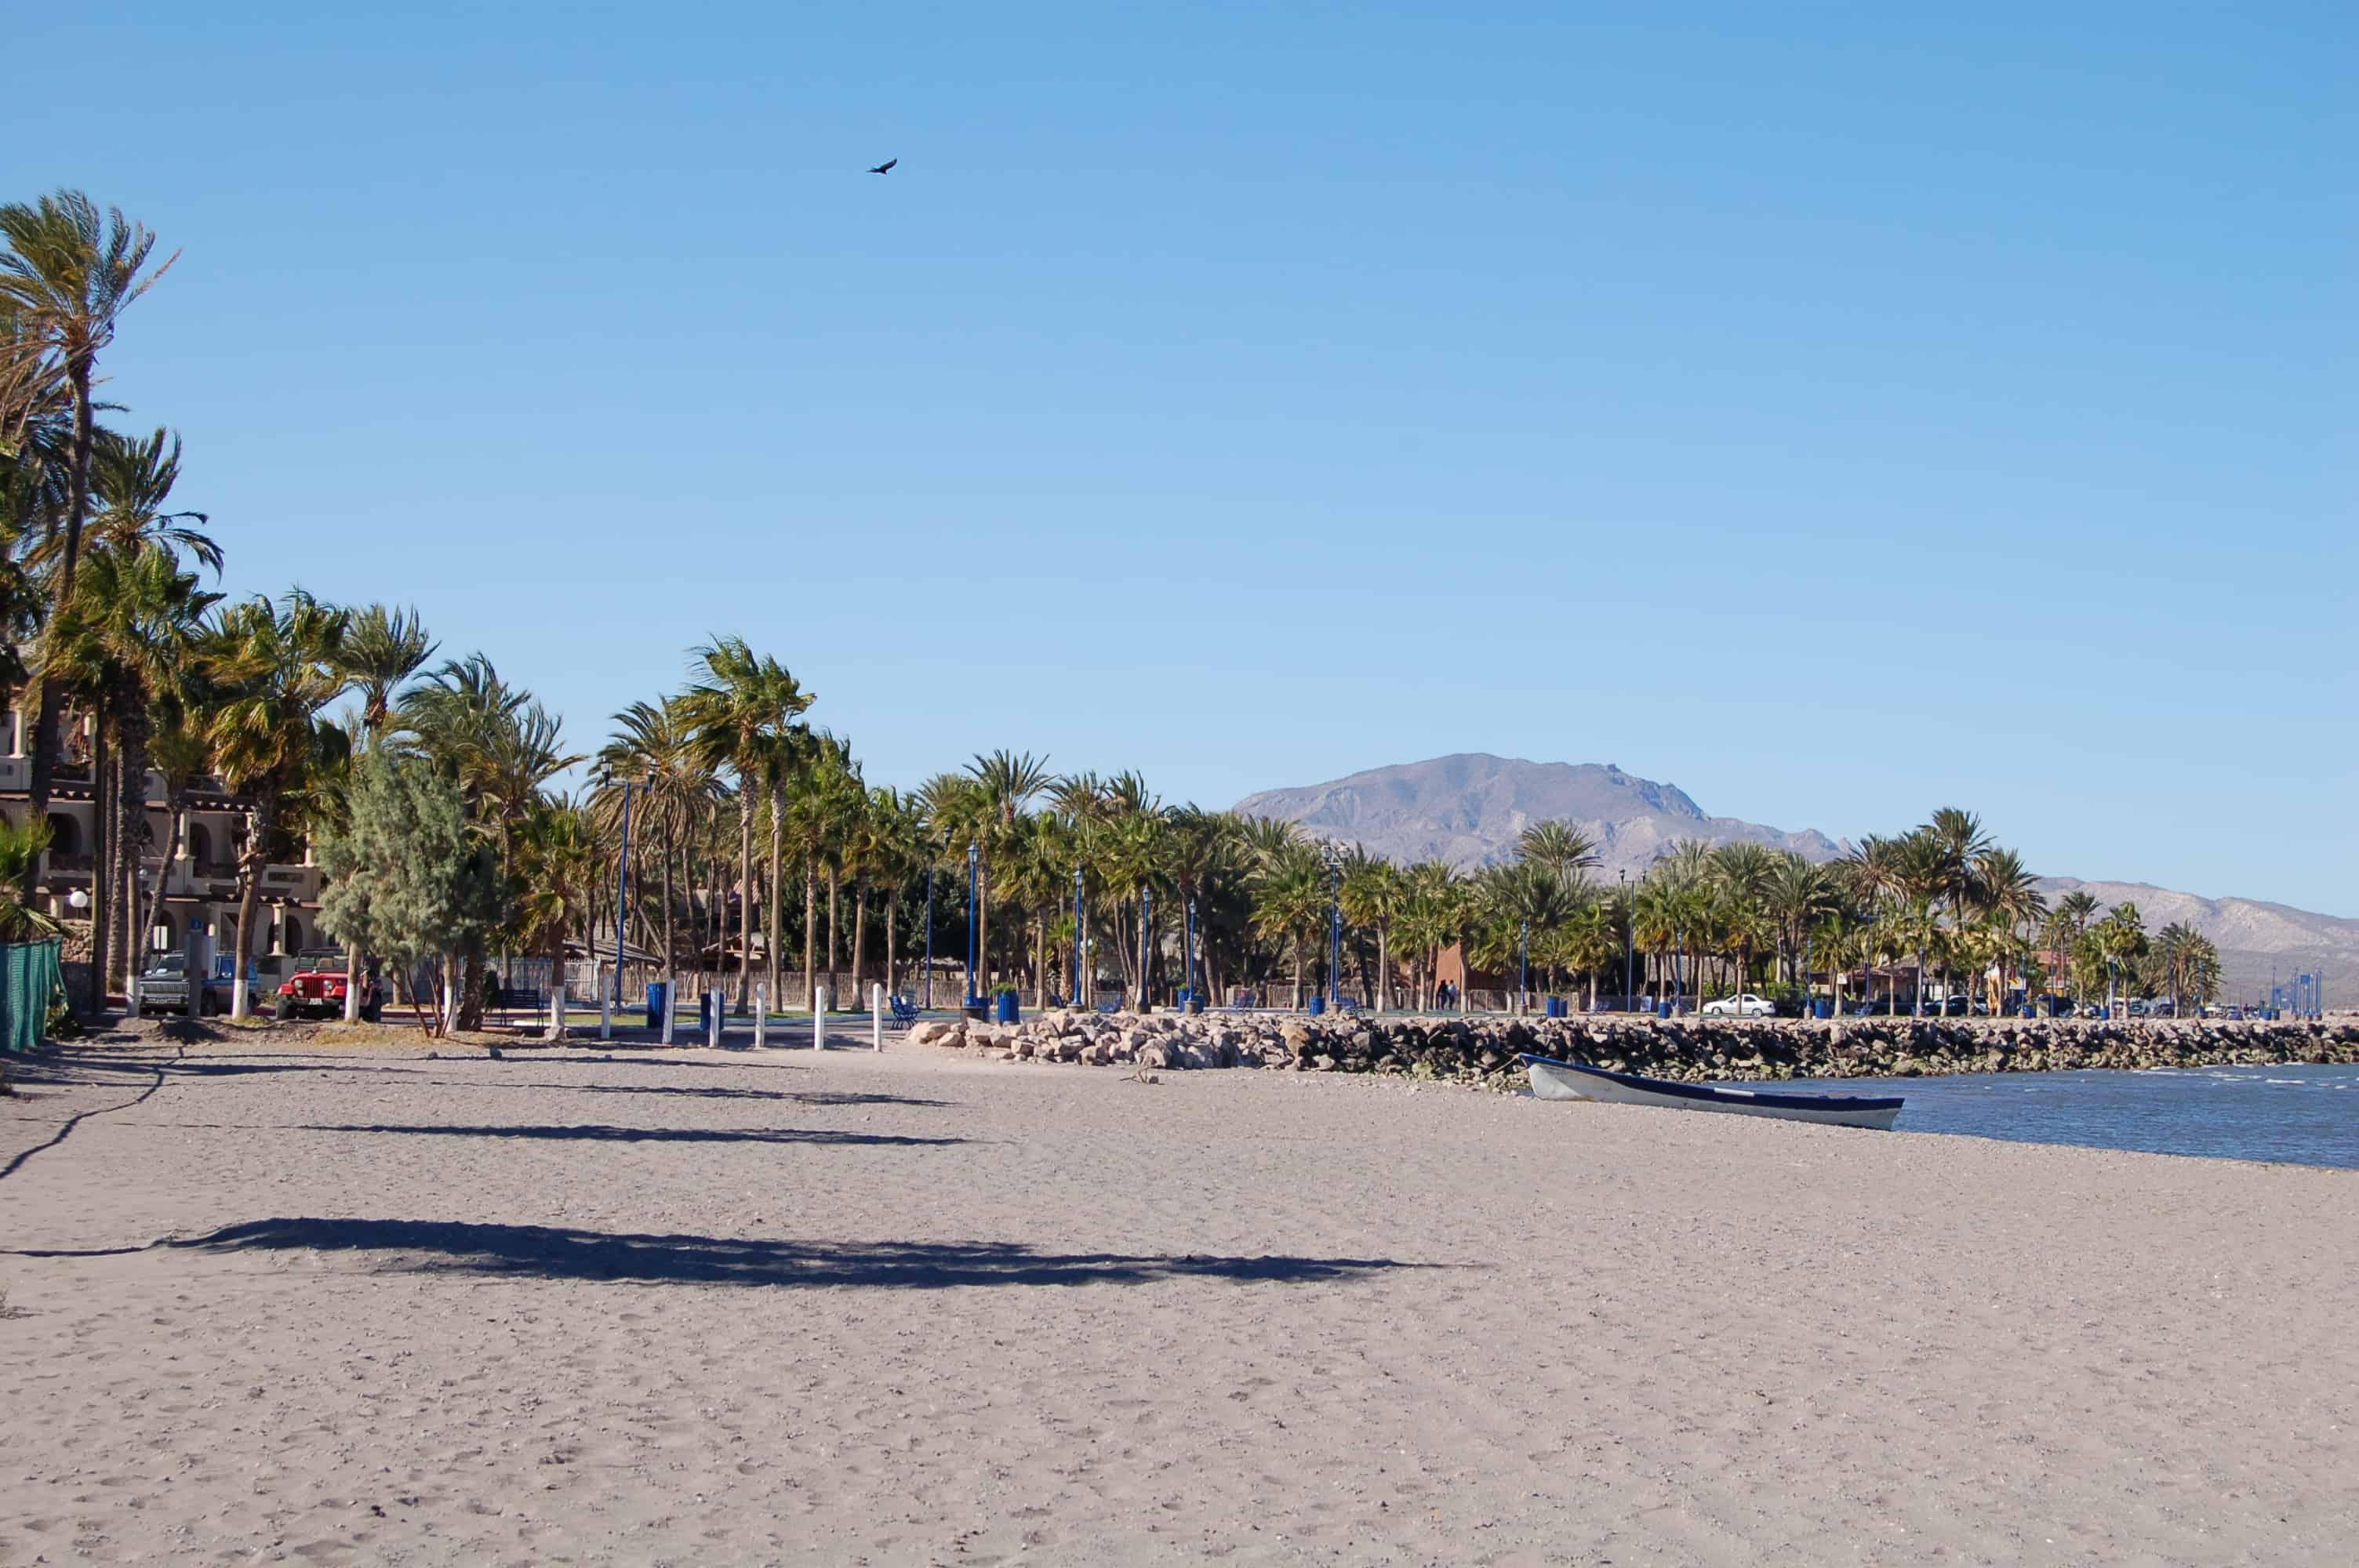 Main Beach, Loreto Baja California, Baja California, Sea of Cortez Beaches, Loreto beaches, Loreto travel, Loreto vacations, best Mexico beaches